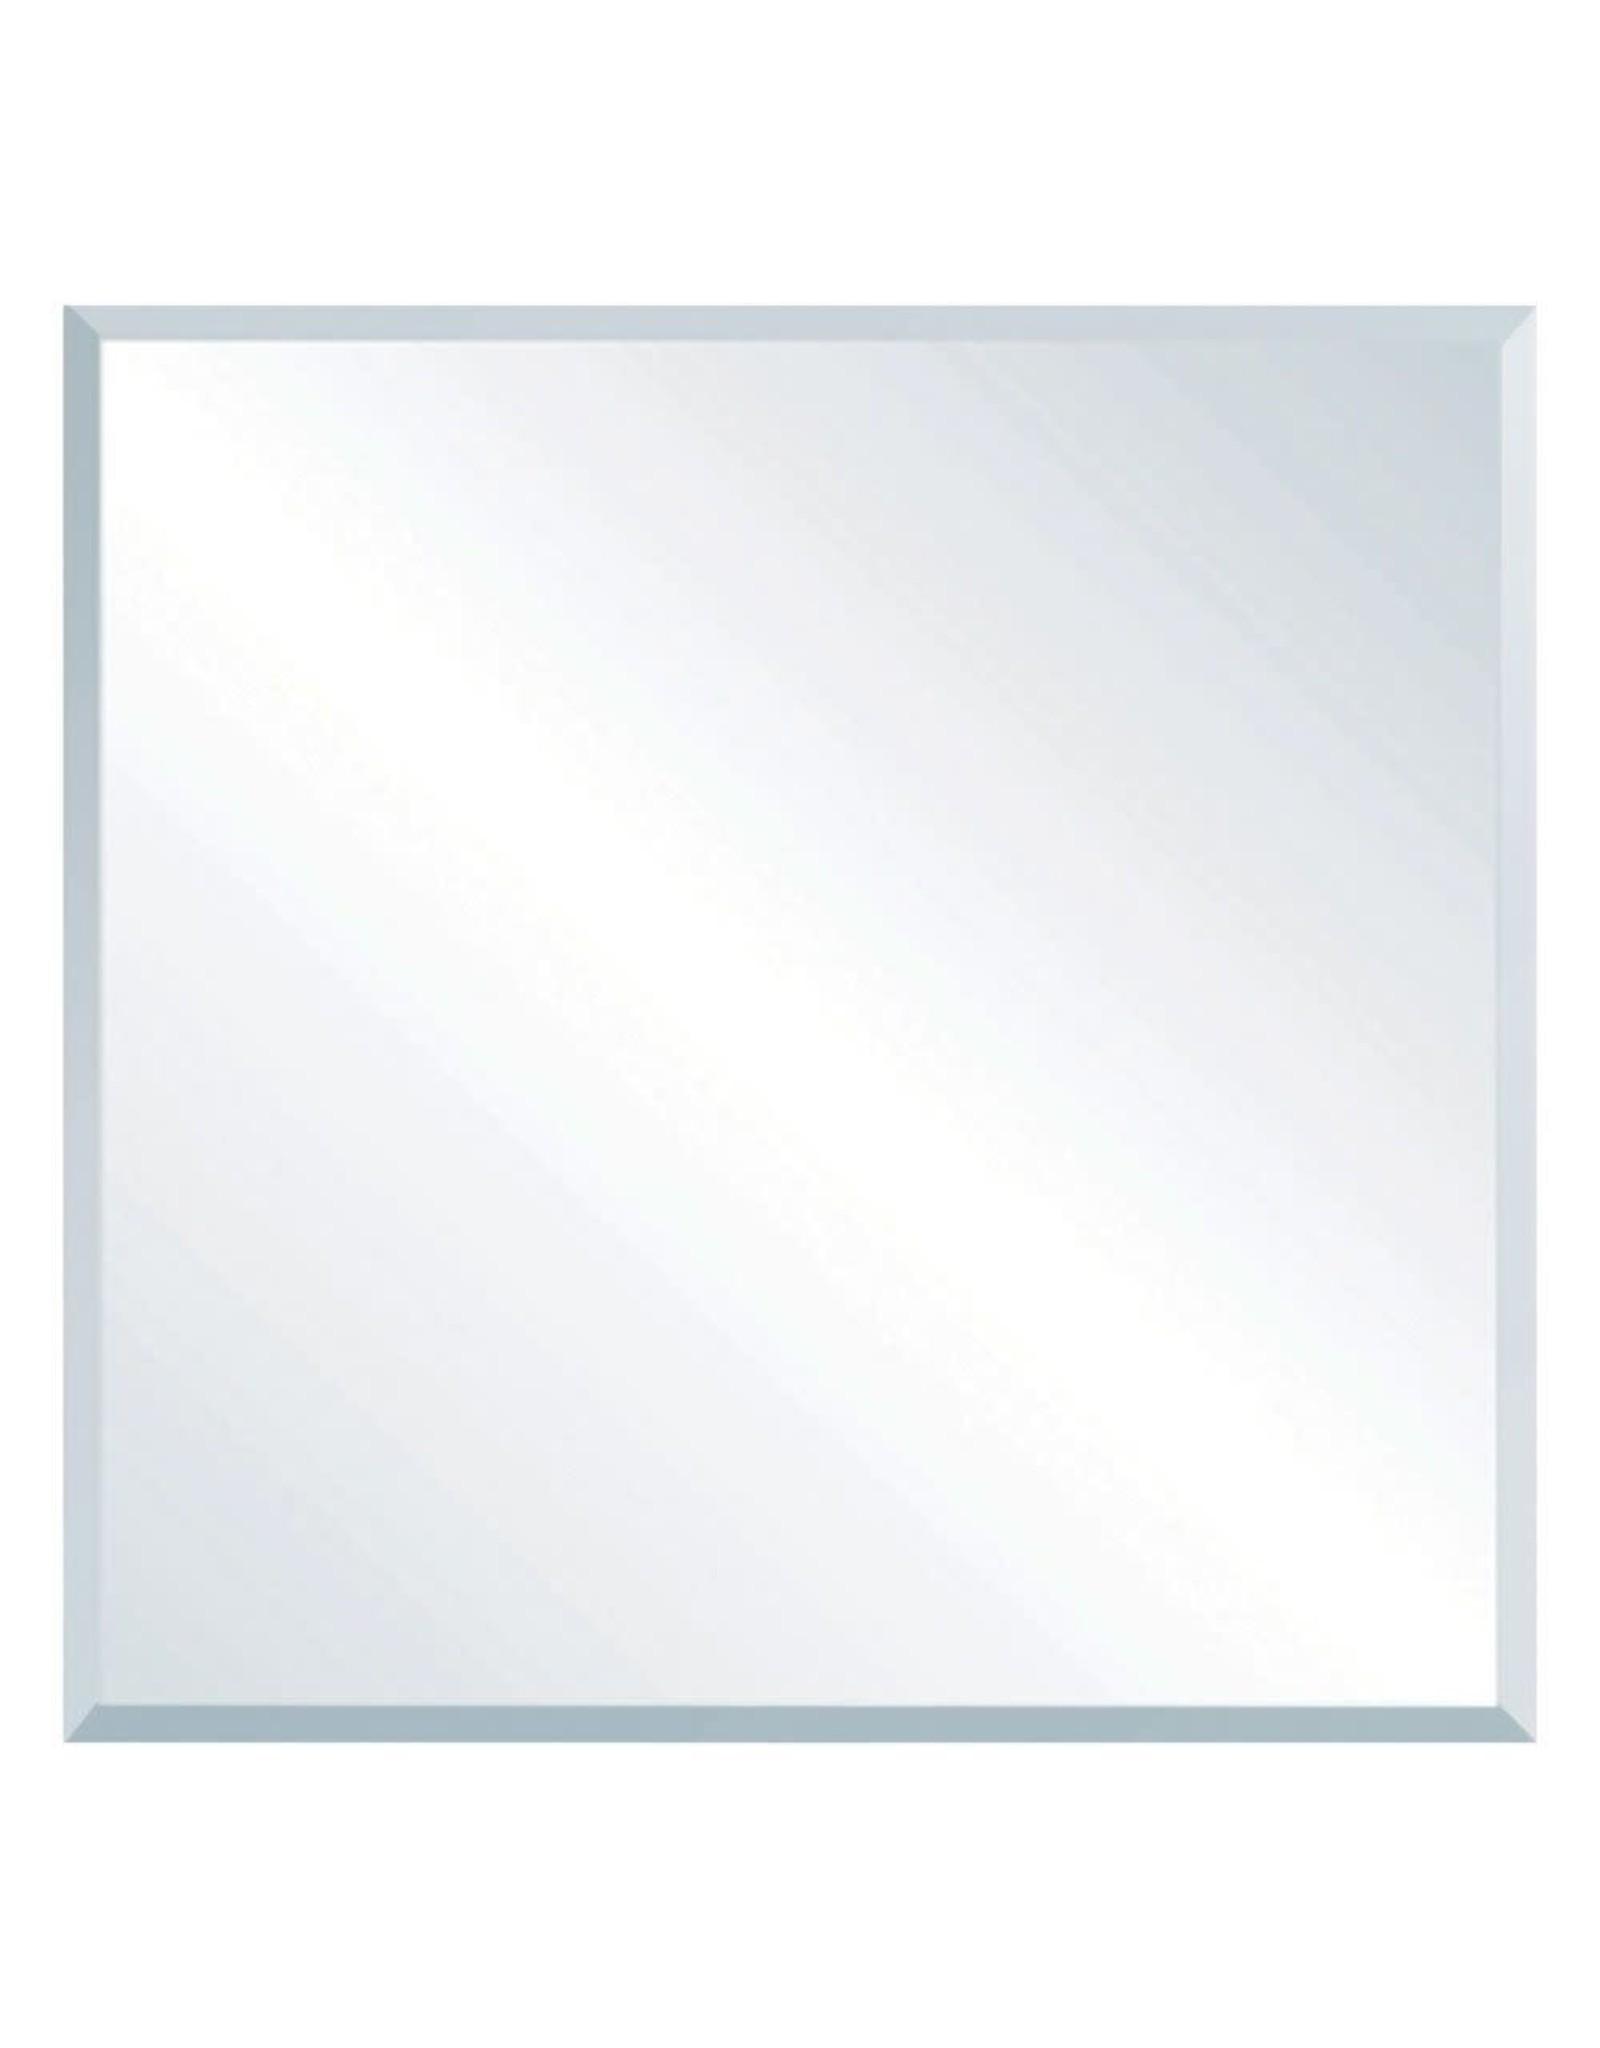 FIENZA 1500x800, FIENZA, Bevel Edge Mirror